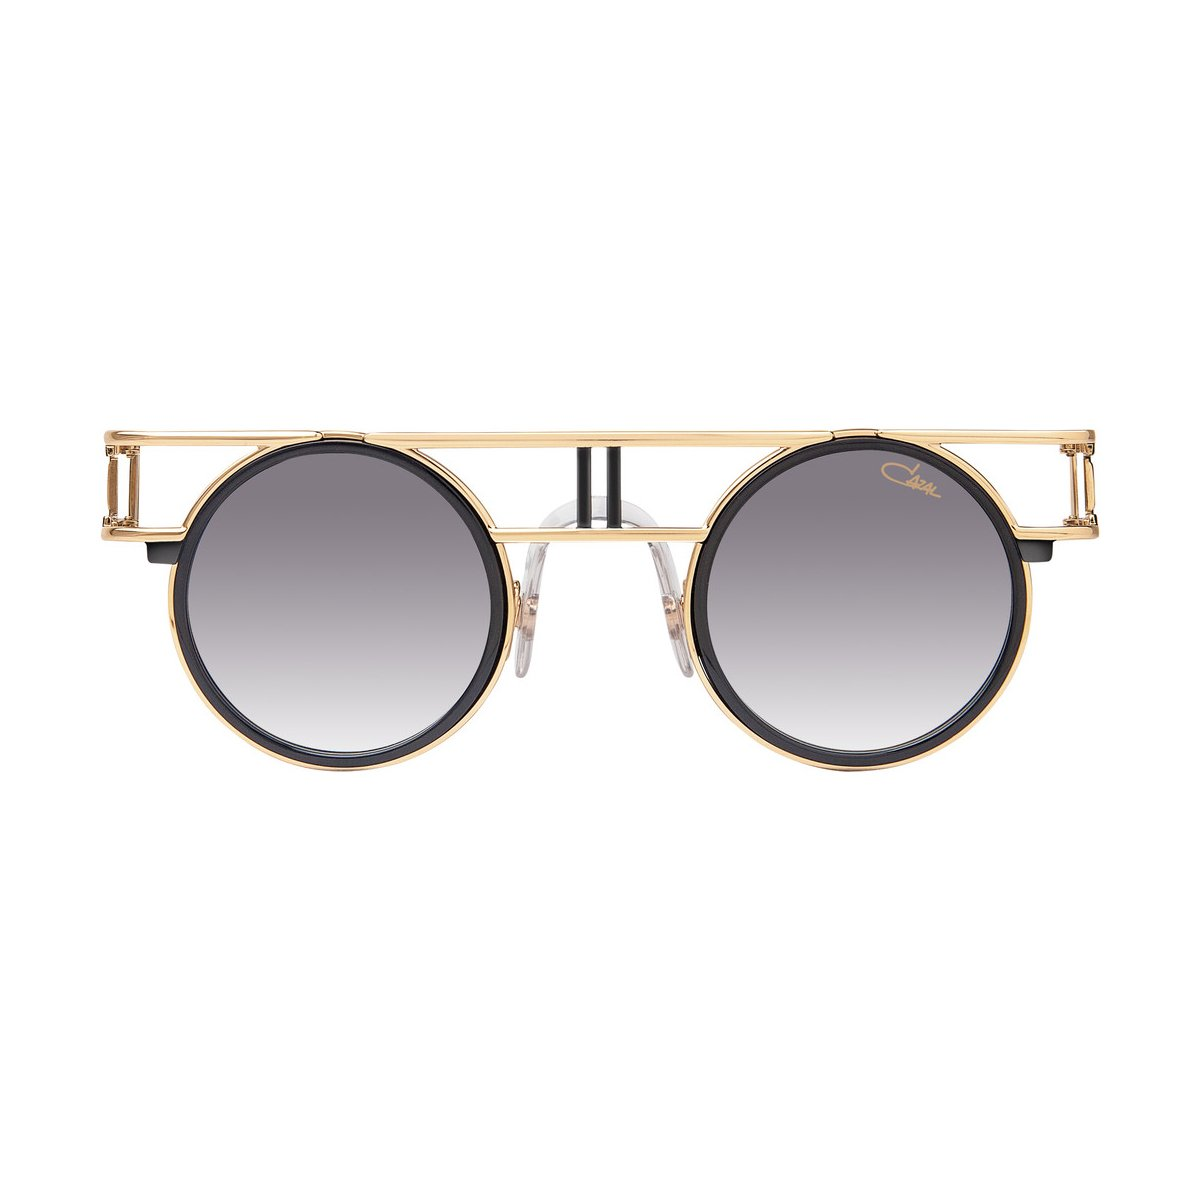 Amazon.com: Gafas de sol Cazal Legends 668 001 negro oro ...